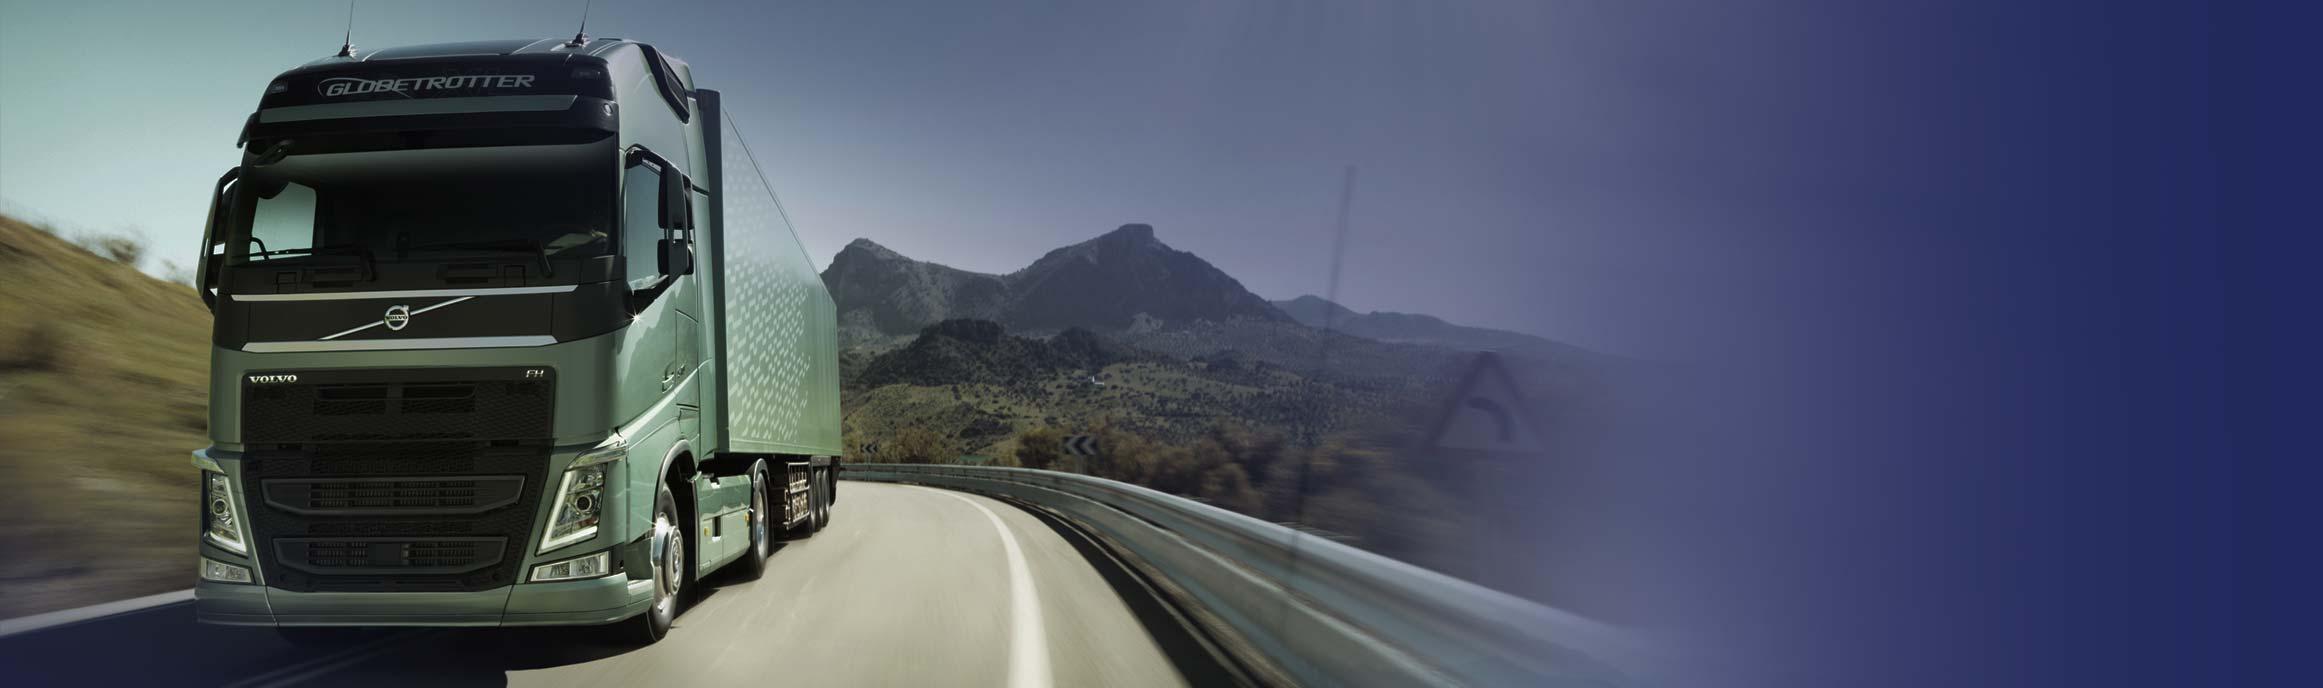 Volvo FH Trucks bij BAS Truck Center